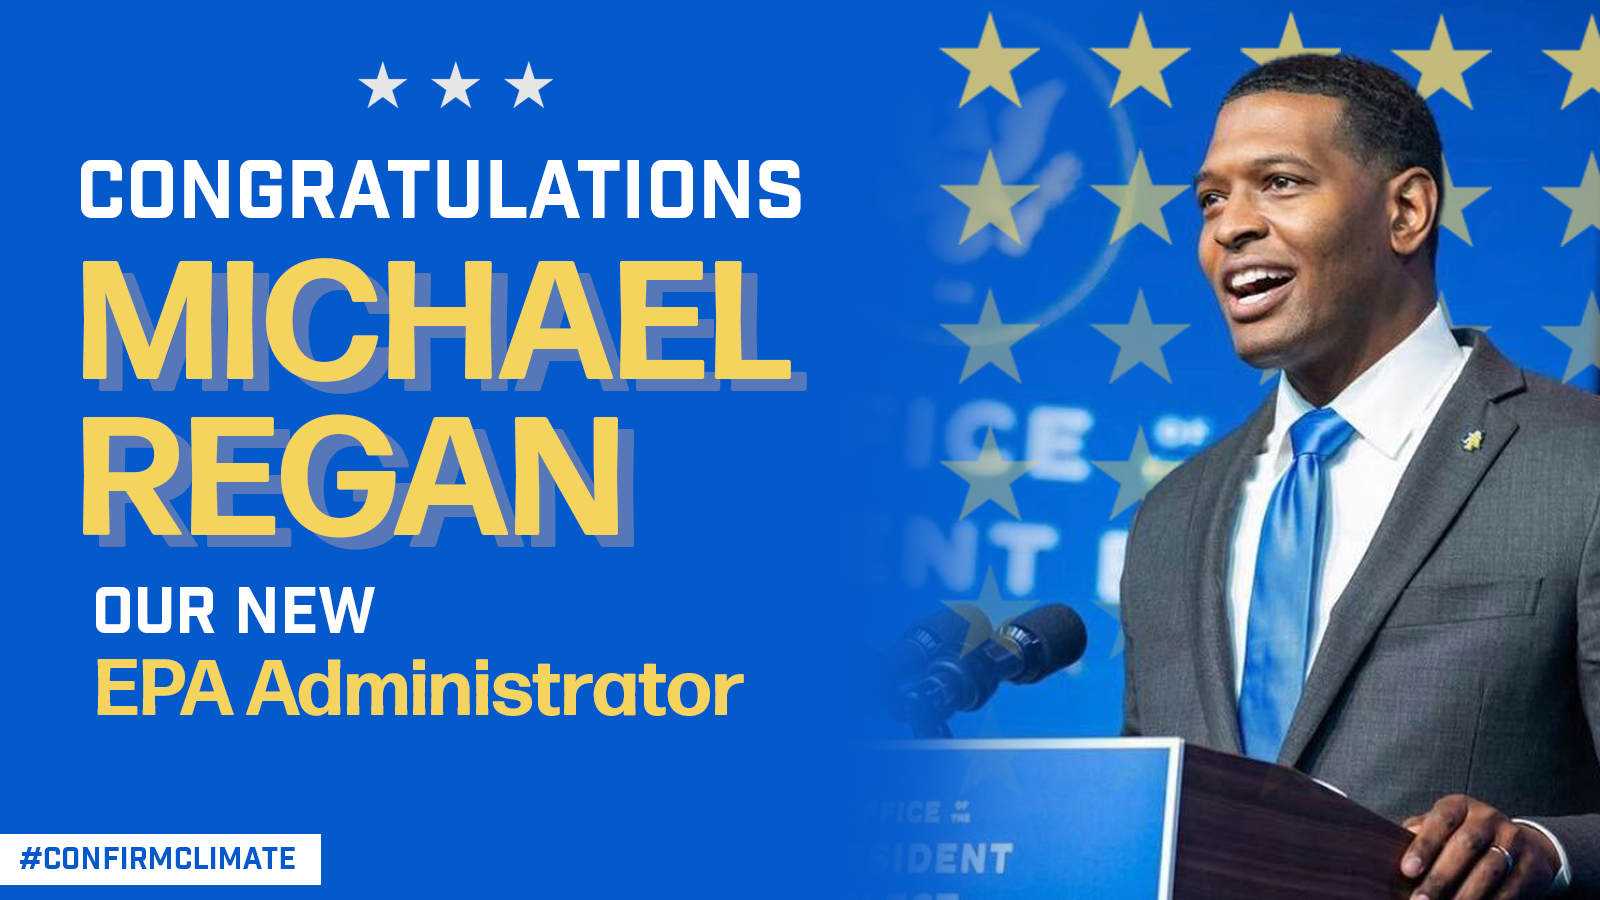 EEN Celebrates Michael Regan's Confirmation to the EPA